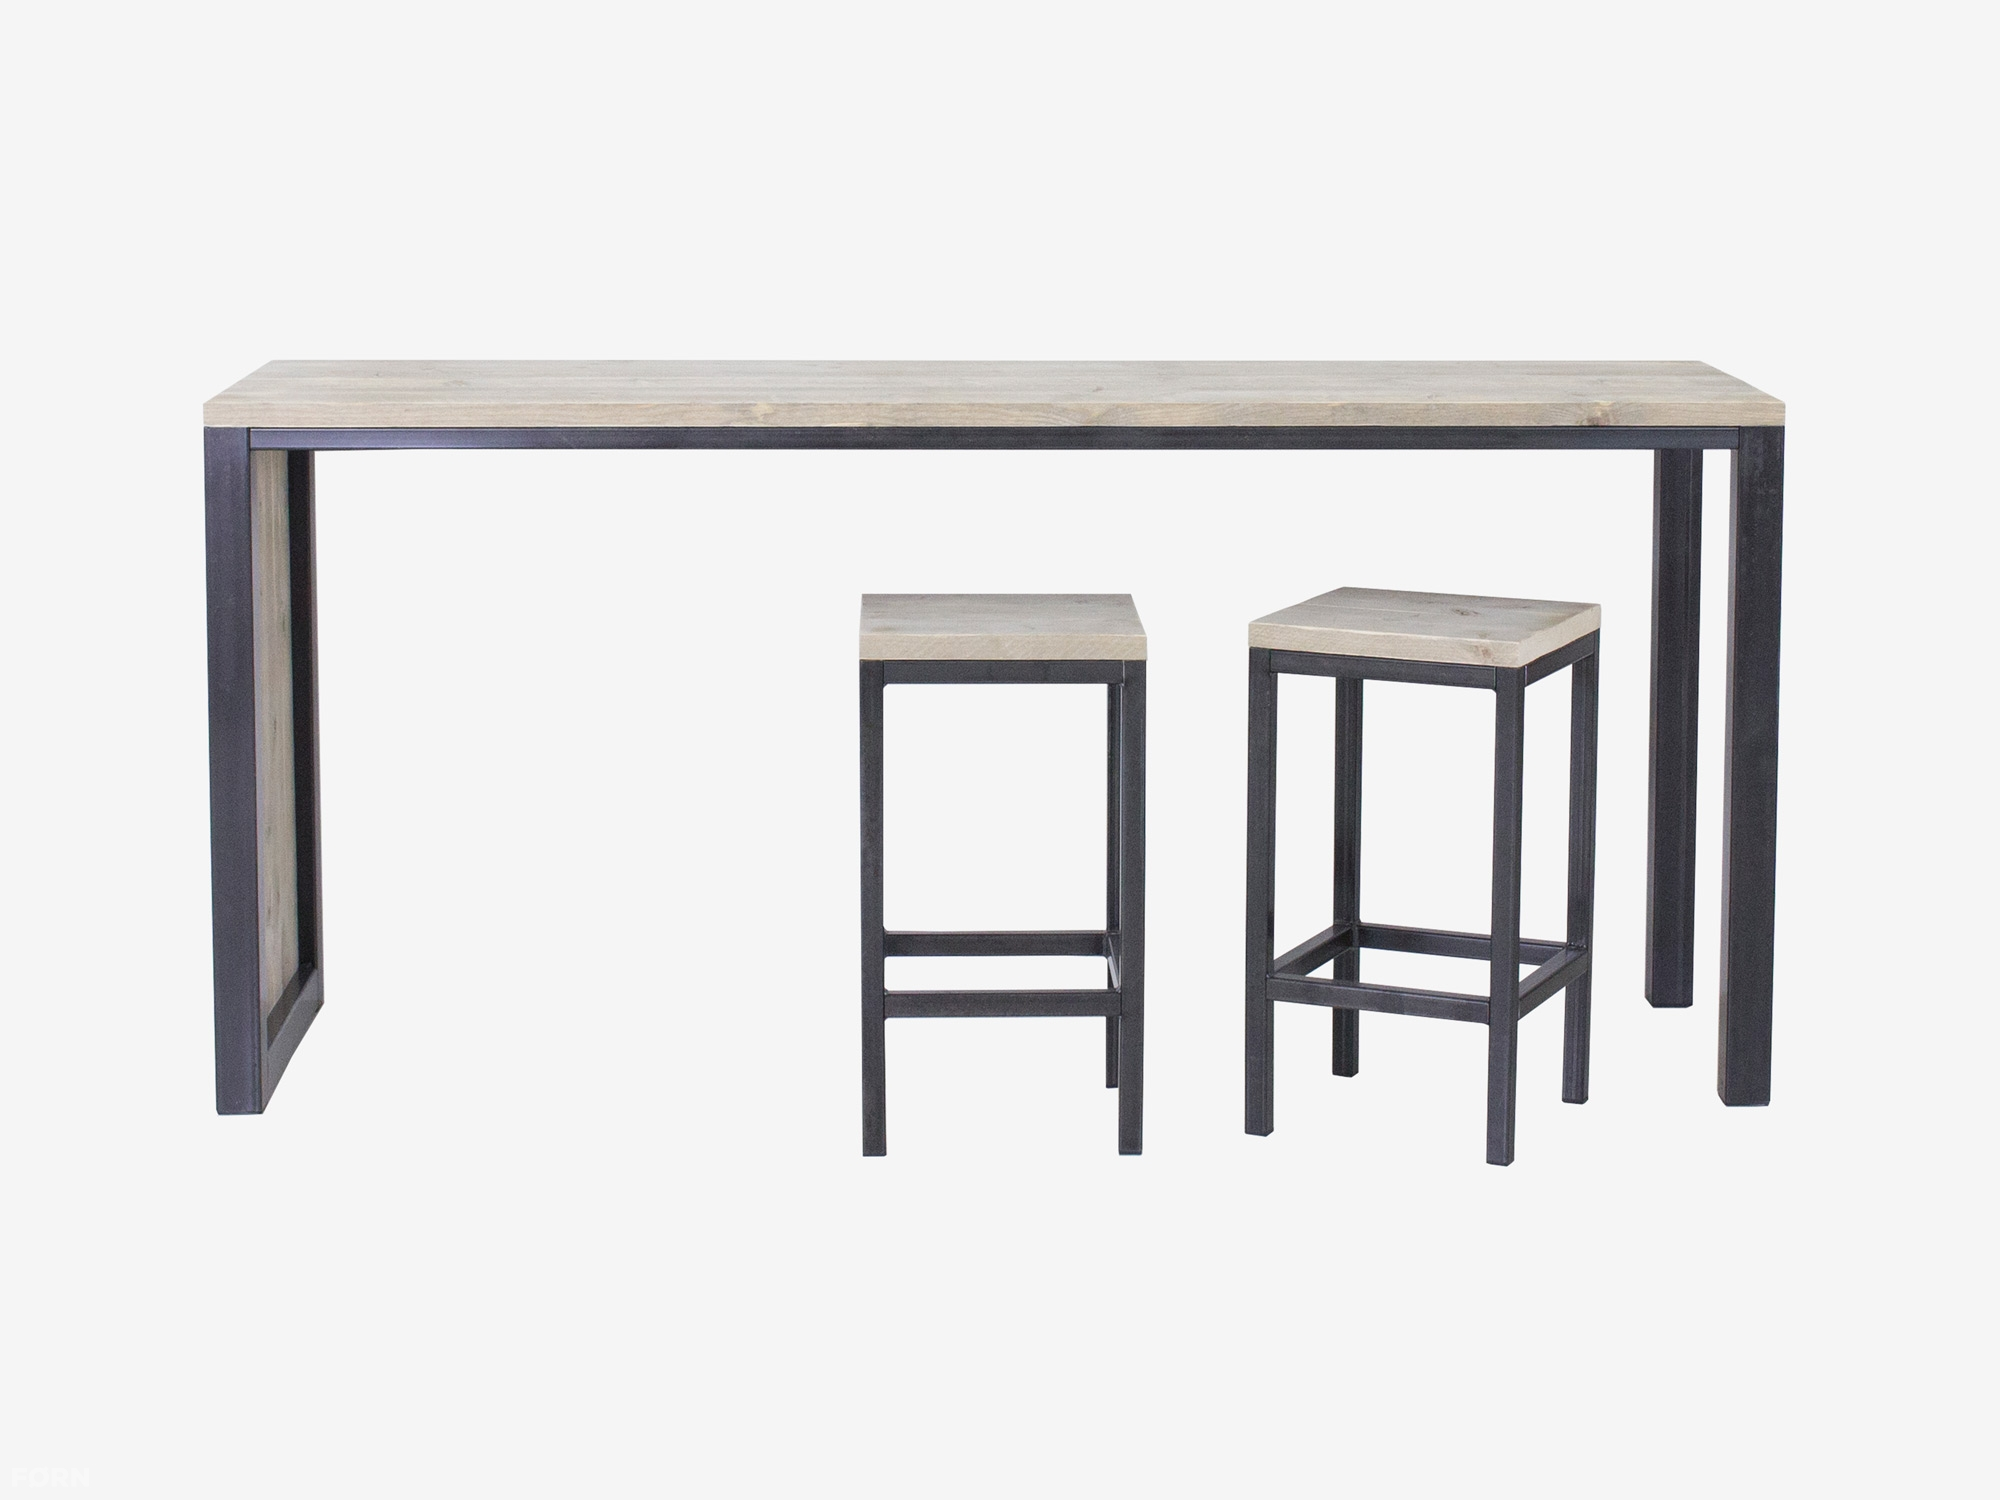 Iets Nieuws Steigerhouten bartafel | FØRN meubelen van steigerhout #EB87